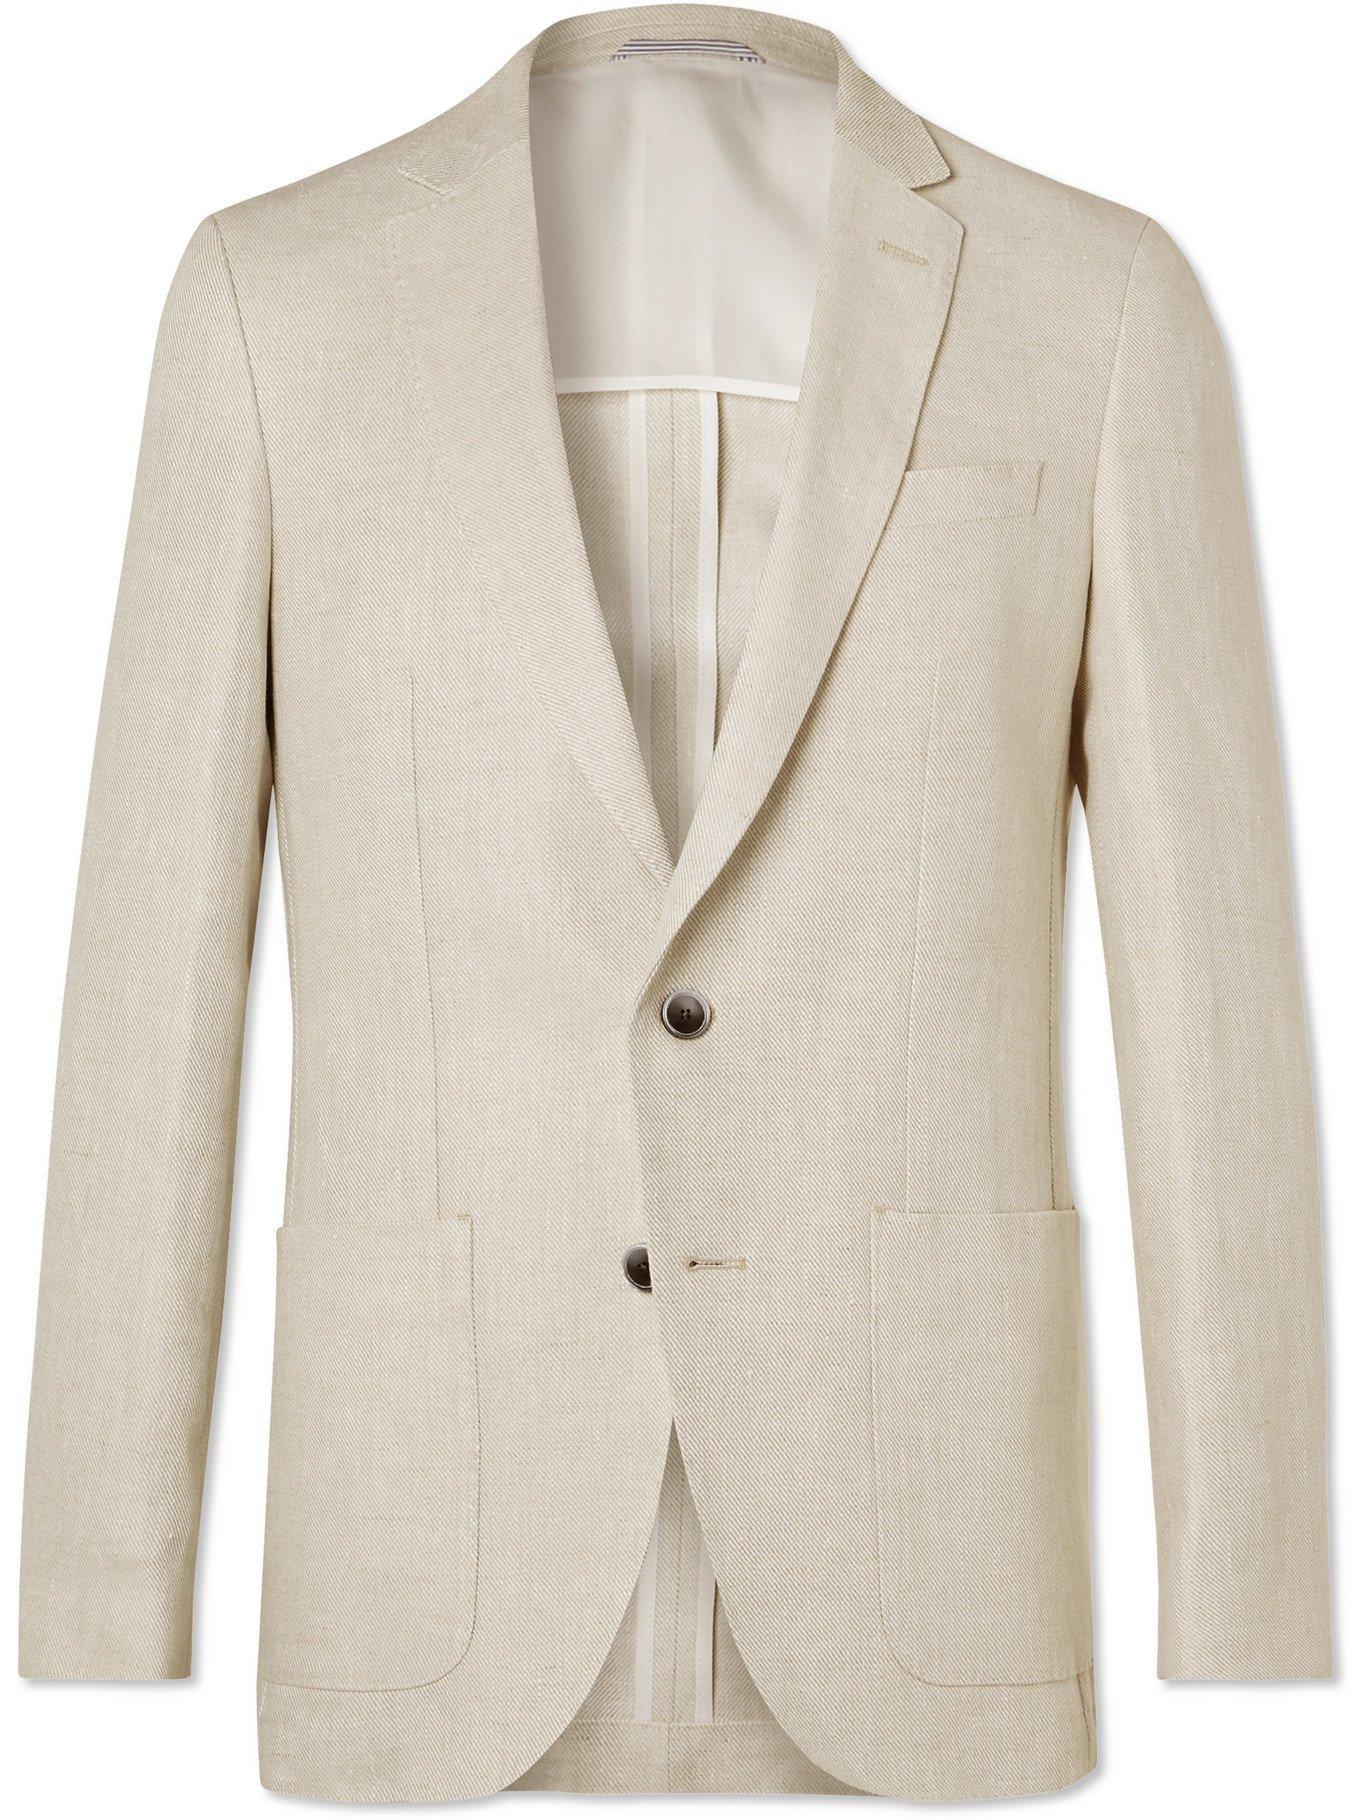 HUGO BOSS - Slim-Fit Linen Blazer - Neutrals